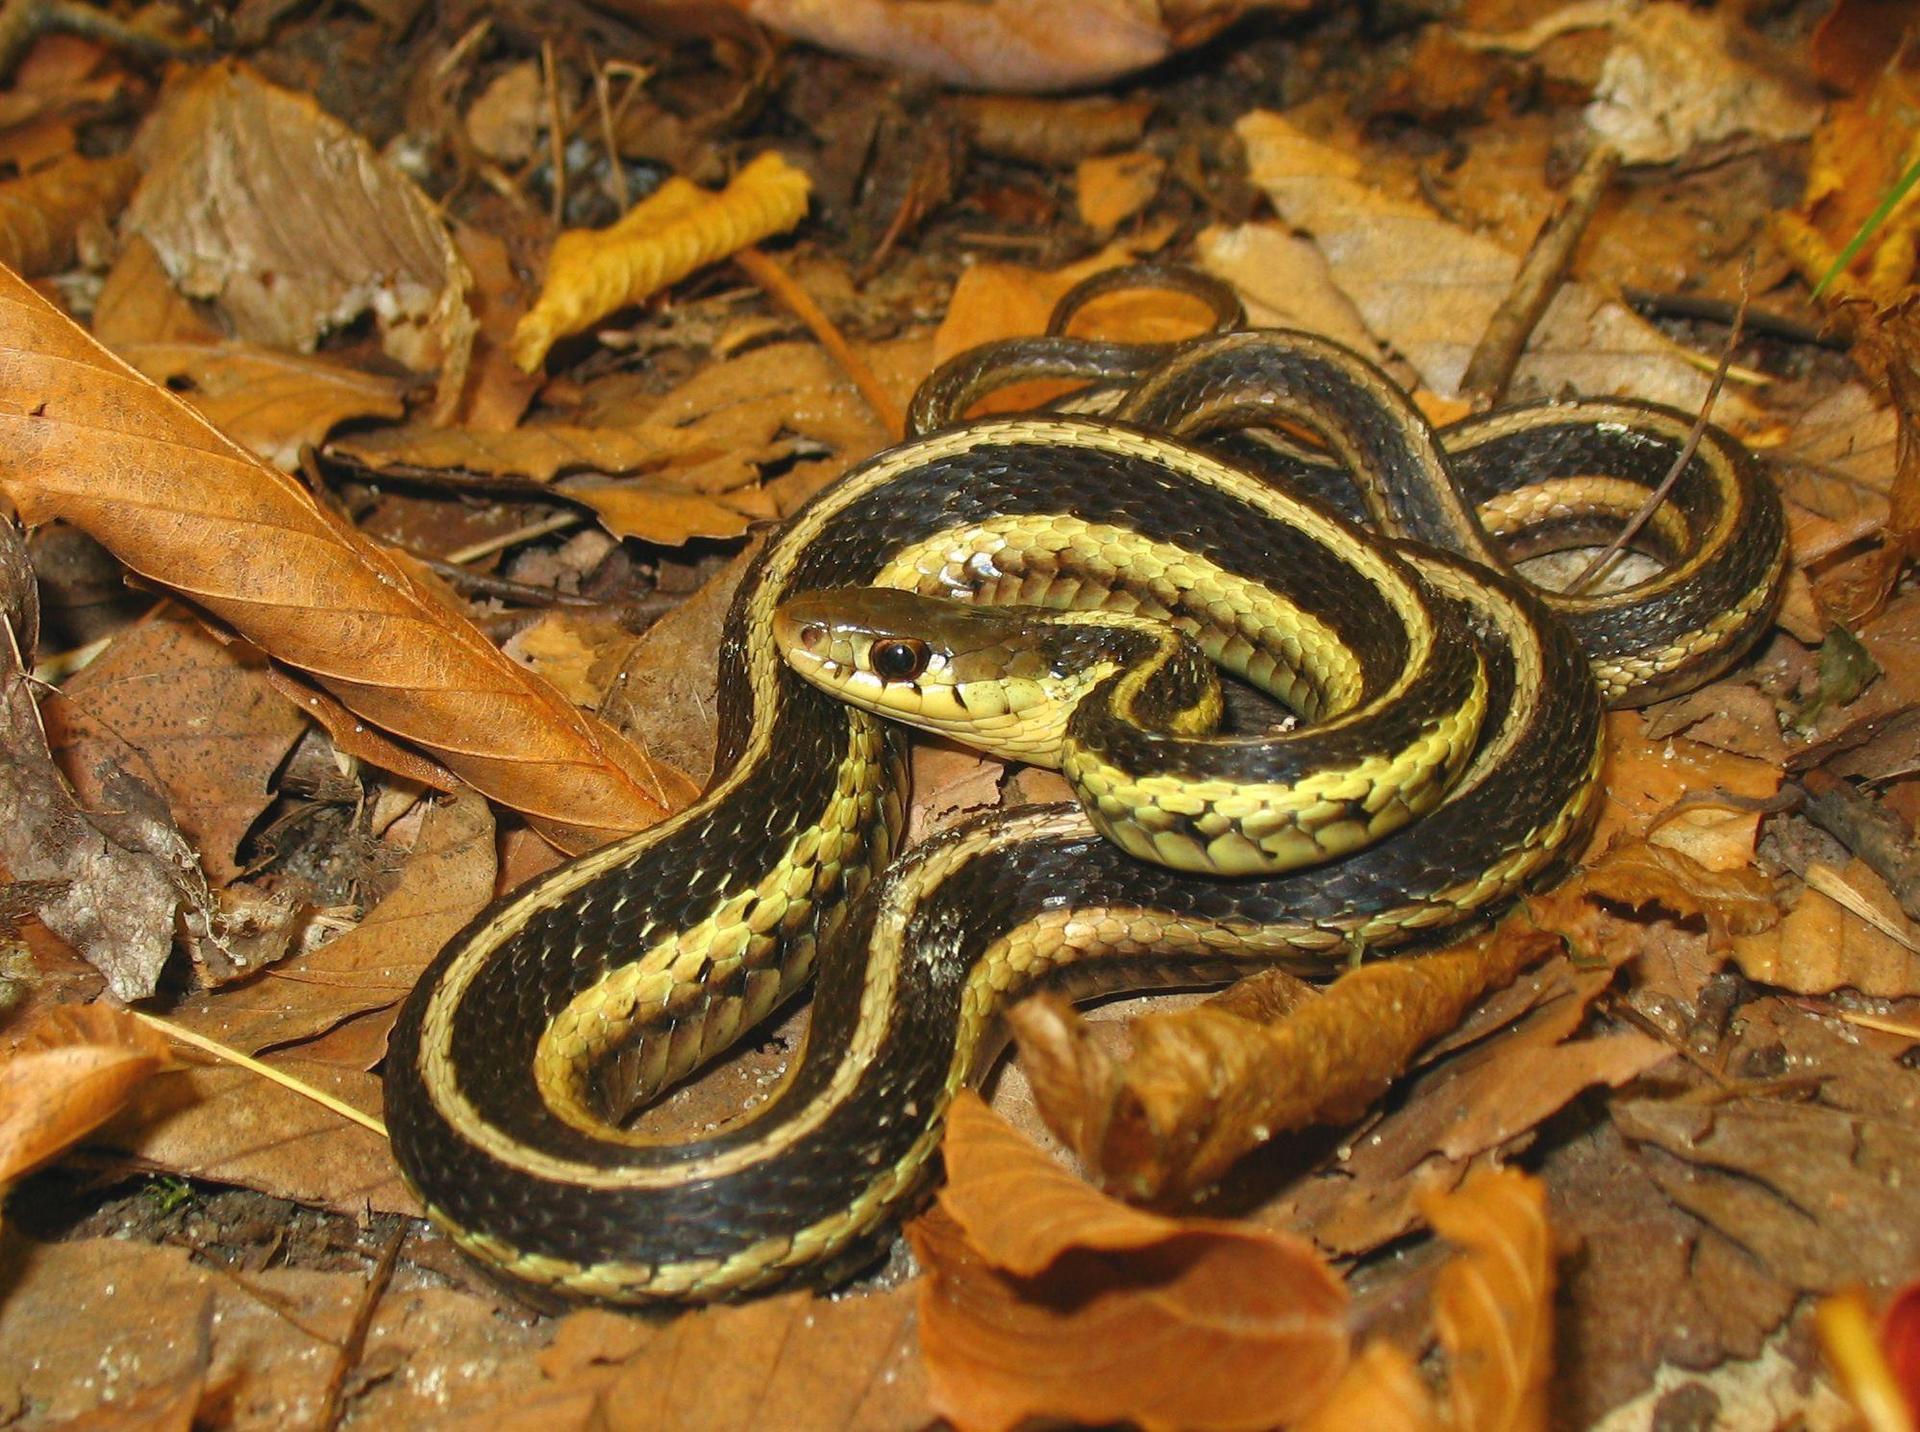 Brown Snake wallpapers HD